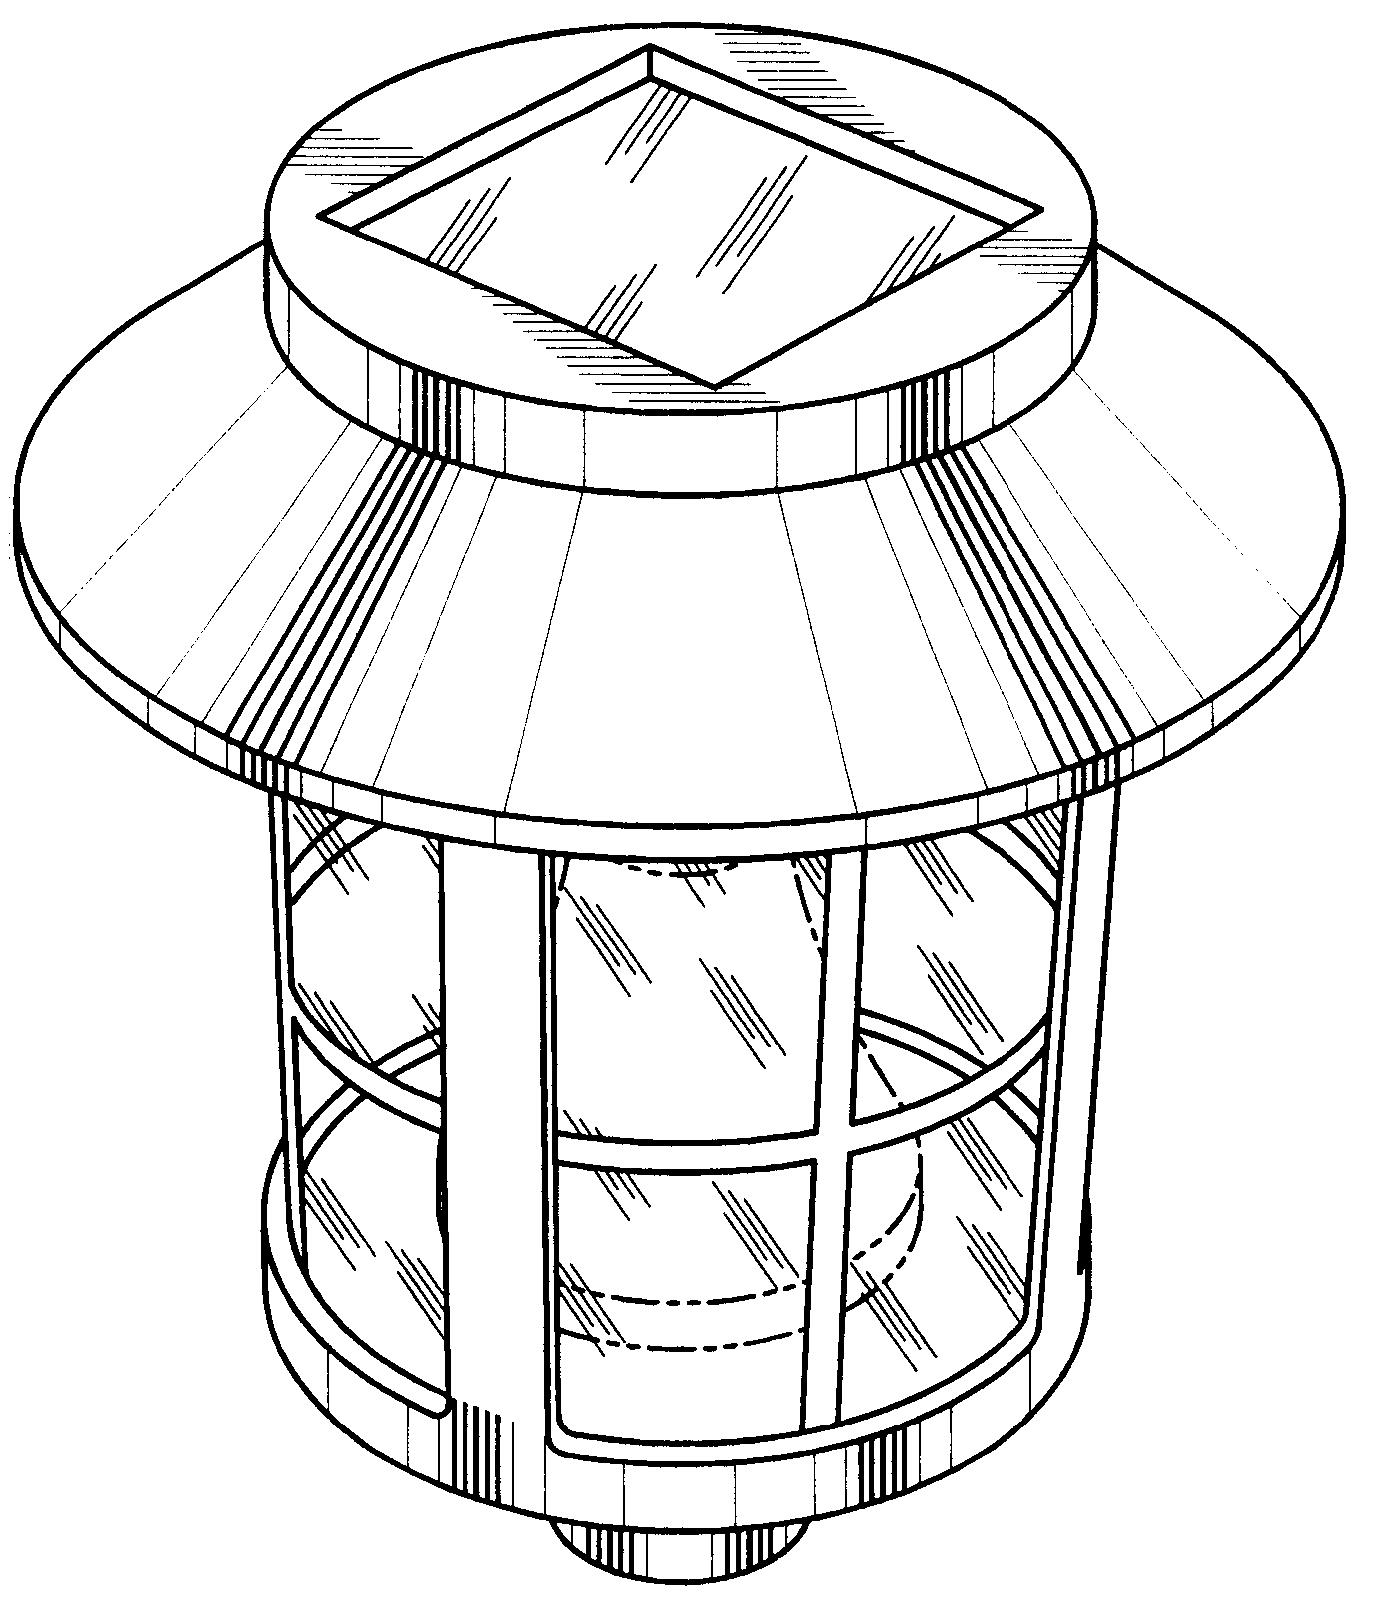 patent usd485930 - solar light